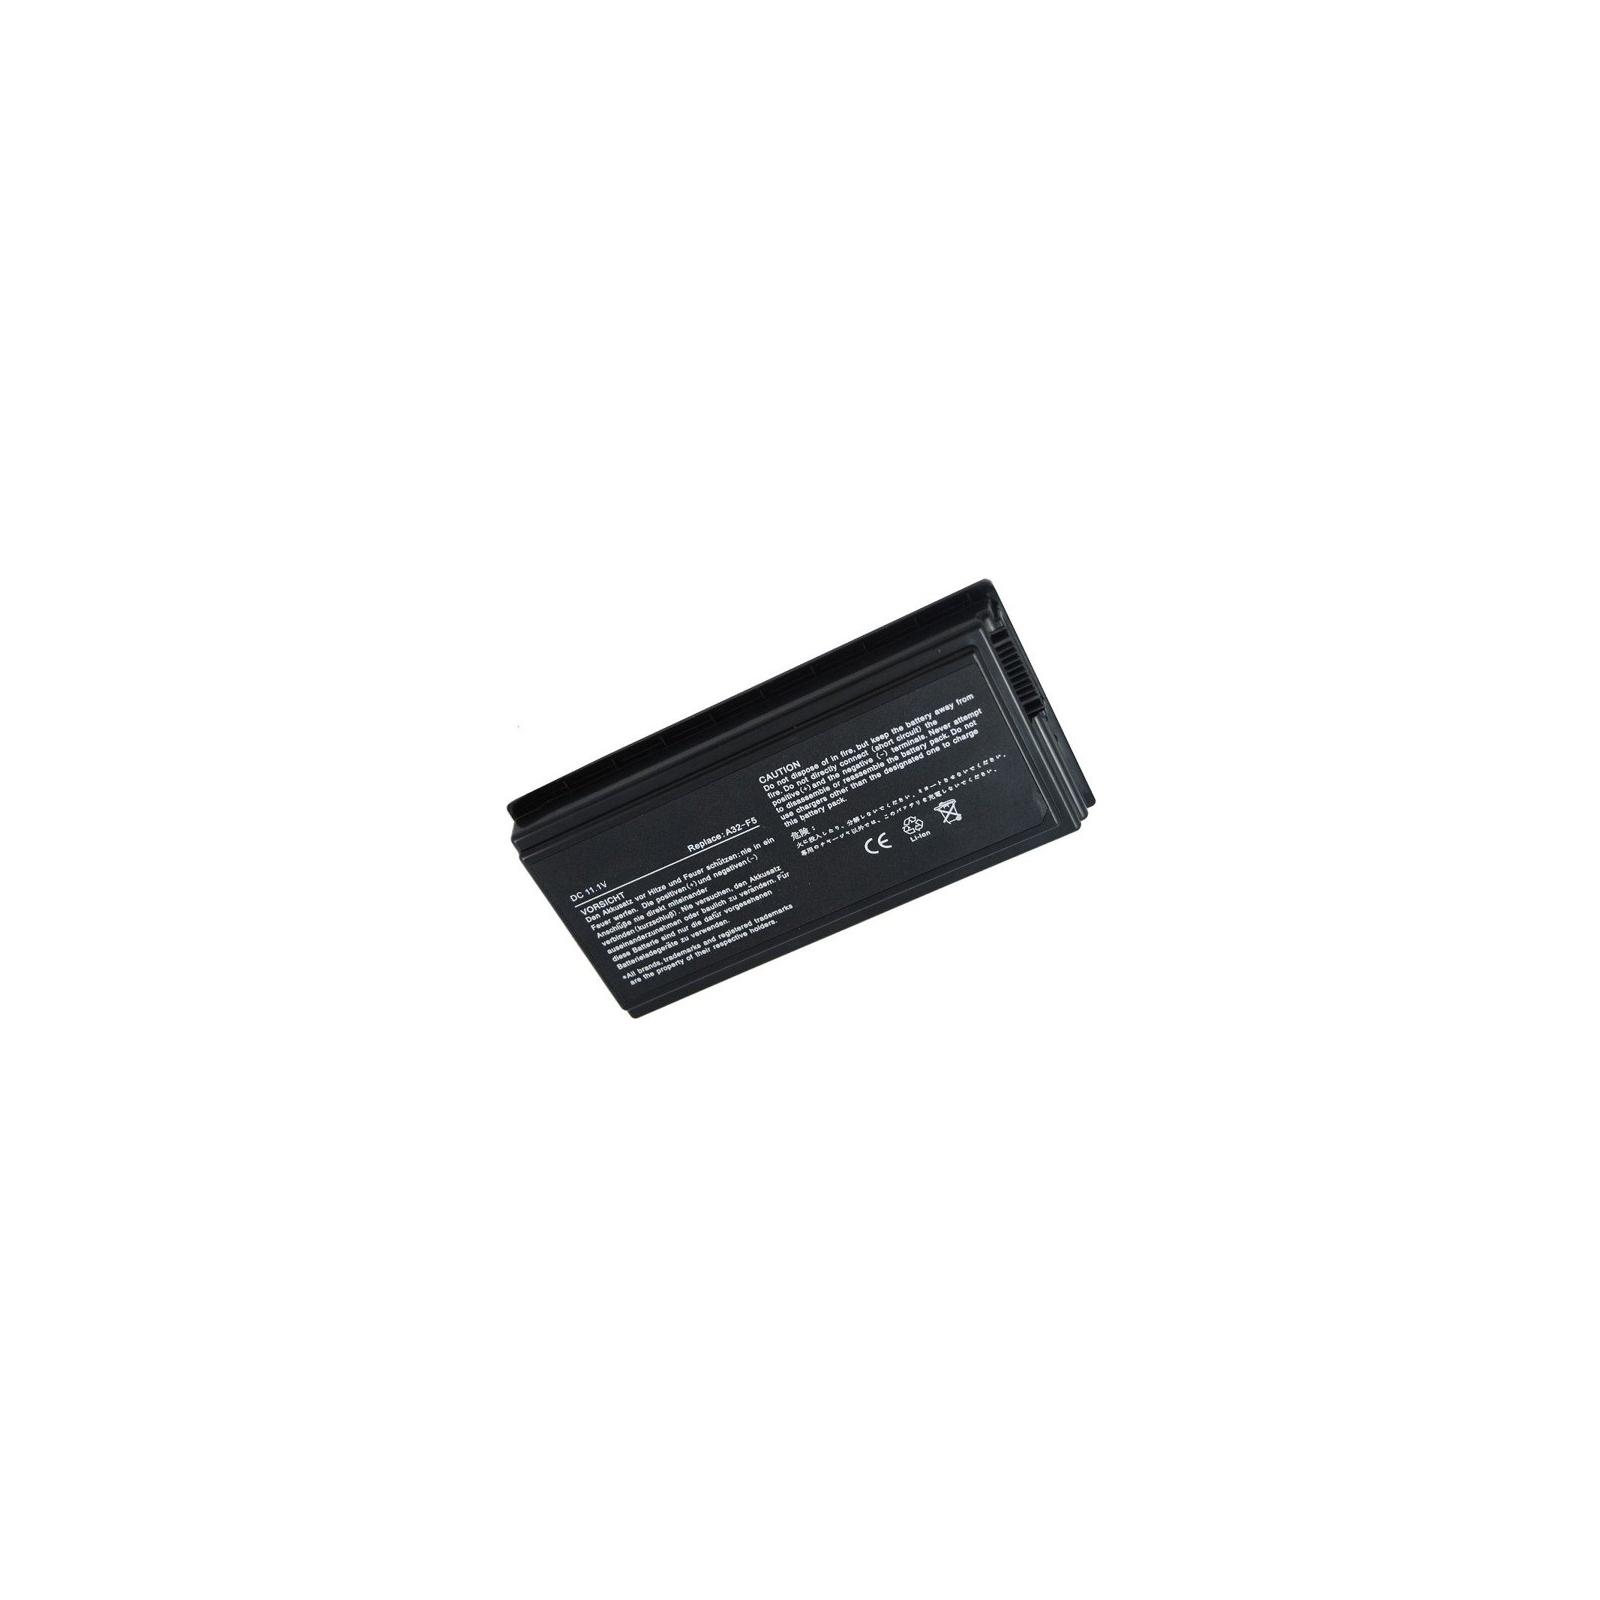 "Аккумулятор для ноутбука APPLE MacBook 13"" (A1280) 10.8V 4800mAh PowerPlant (NB00000106)"